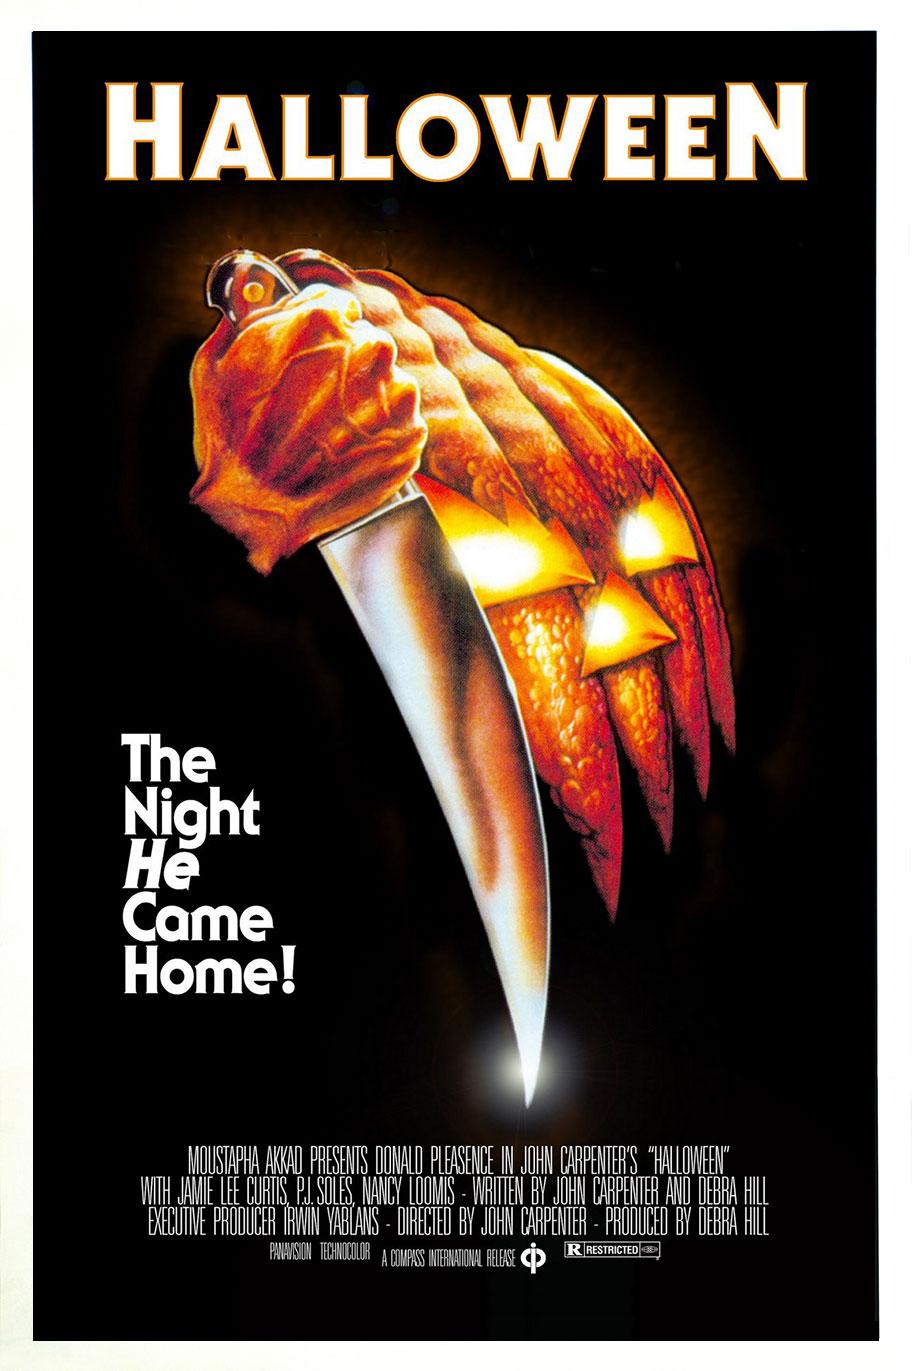 John Carpenter S Horror Classic Halloween Returns To Select Theatres Nationwide Beginning September 27th Entertainment Rocks